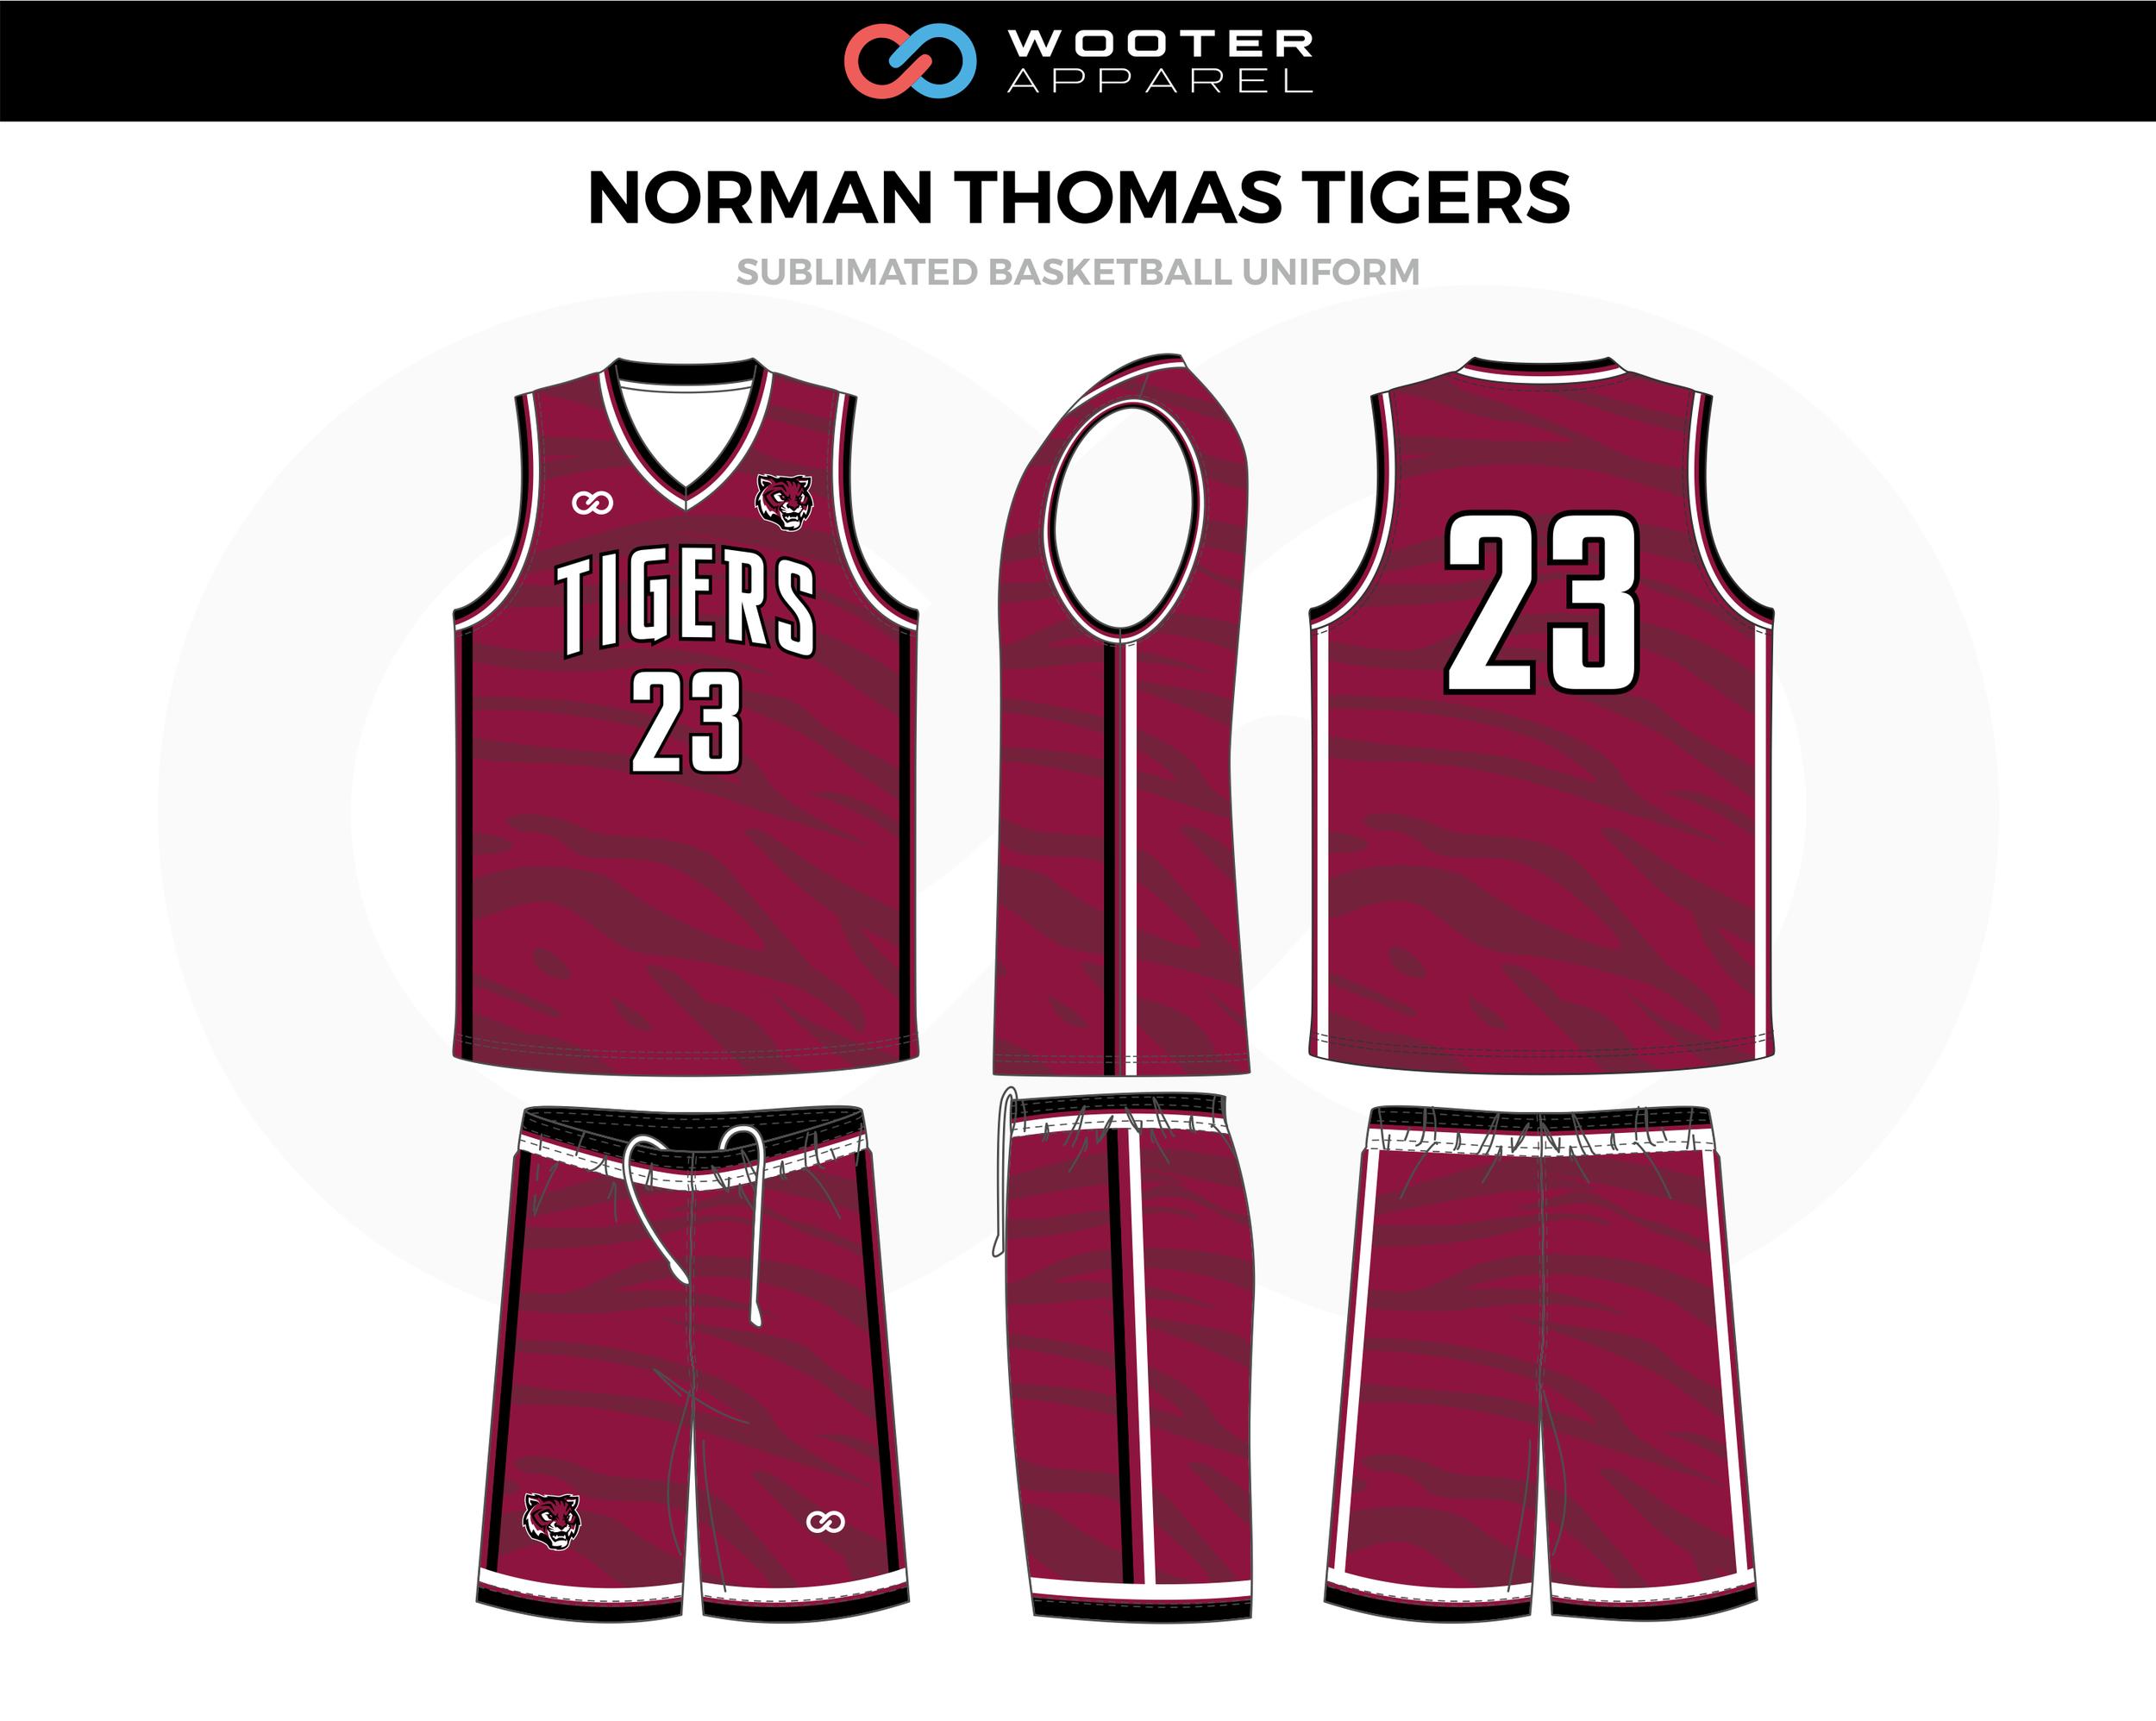 NORMAN THOMAS TIGERS Fuchsia Black White Basketball Uniform, Jersey and Shorts